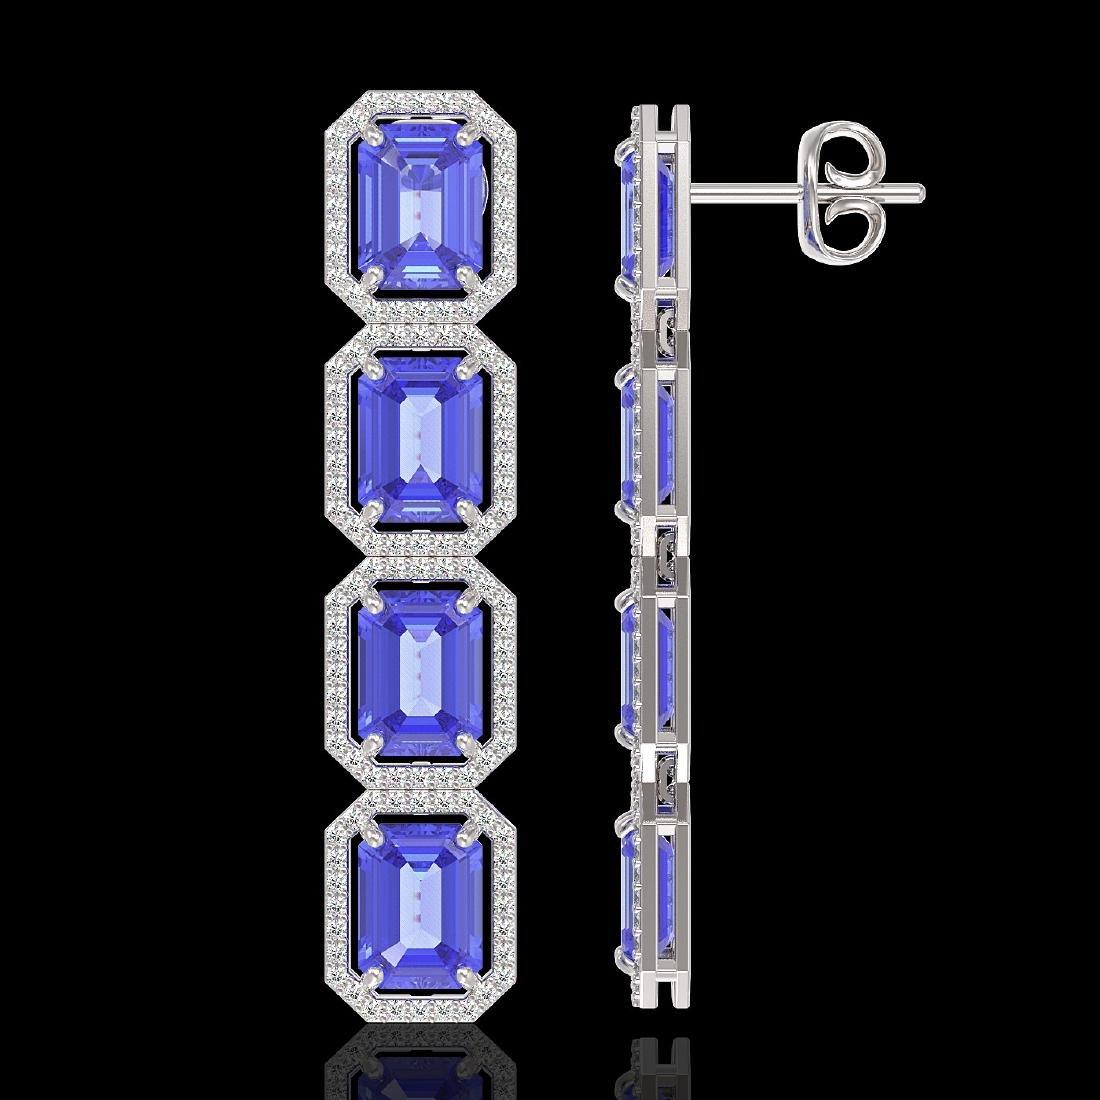 19.39 CTW Tanzanite & Diamond Halo Earrings 10K White - 2